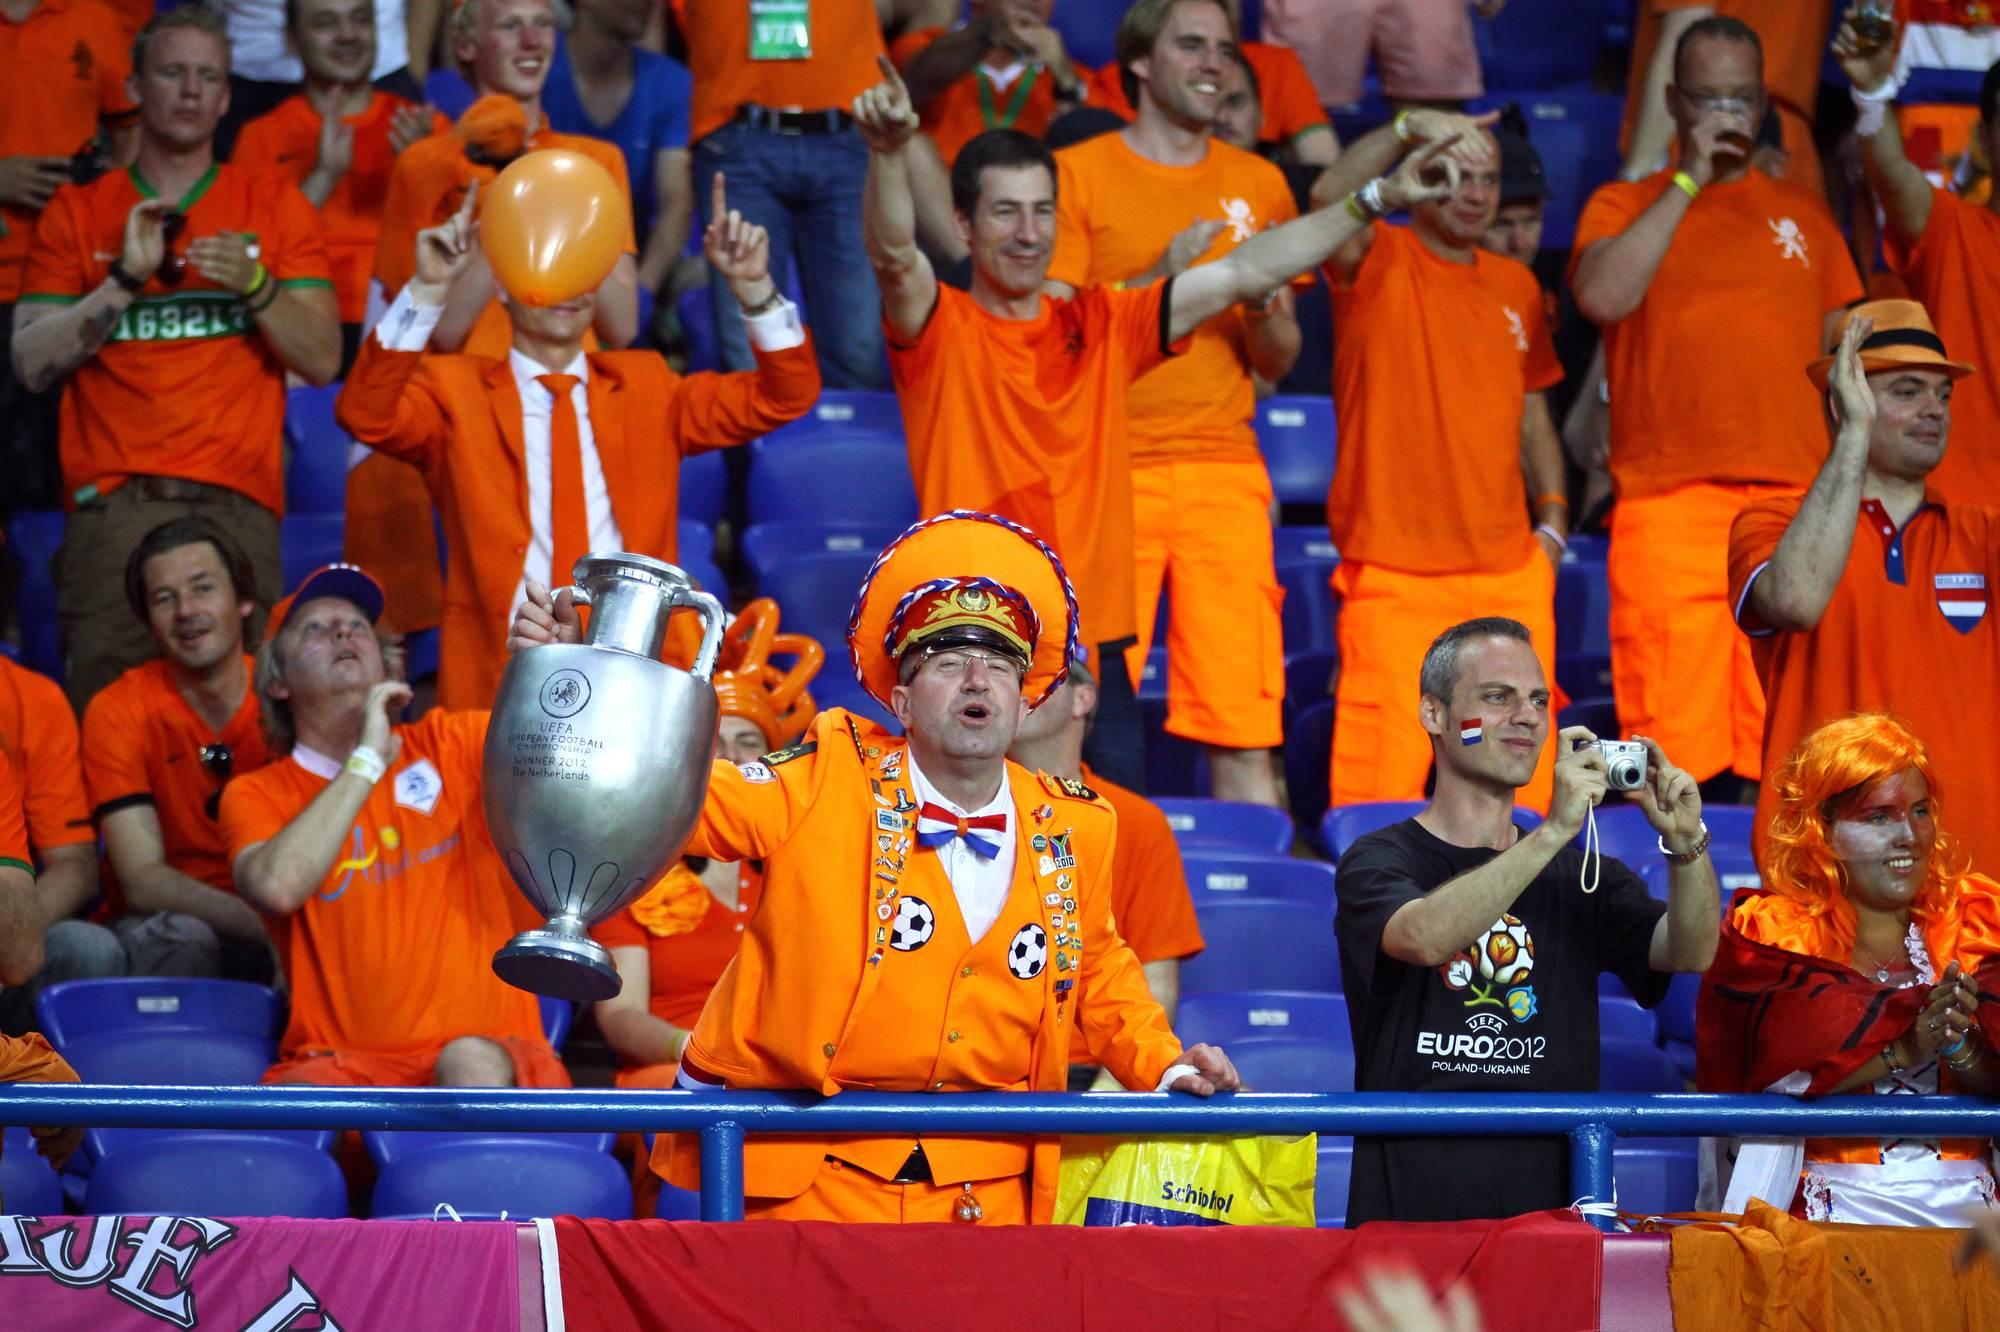 Denzel-Dumfries-playing-at-the-Dutch-Euros-match